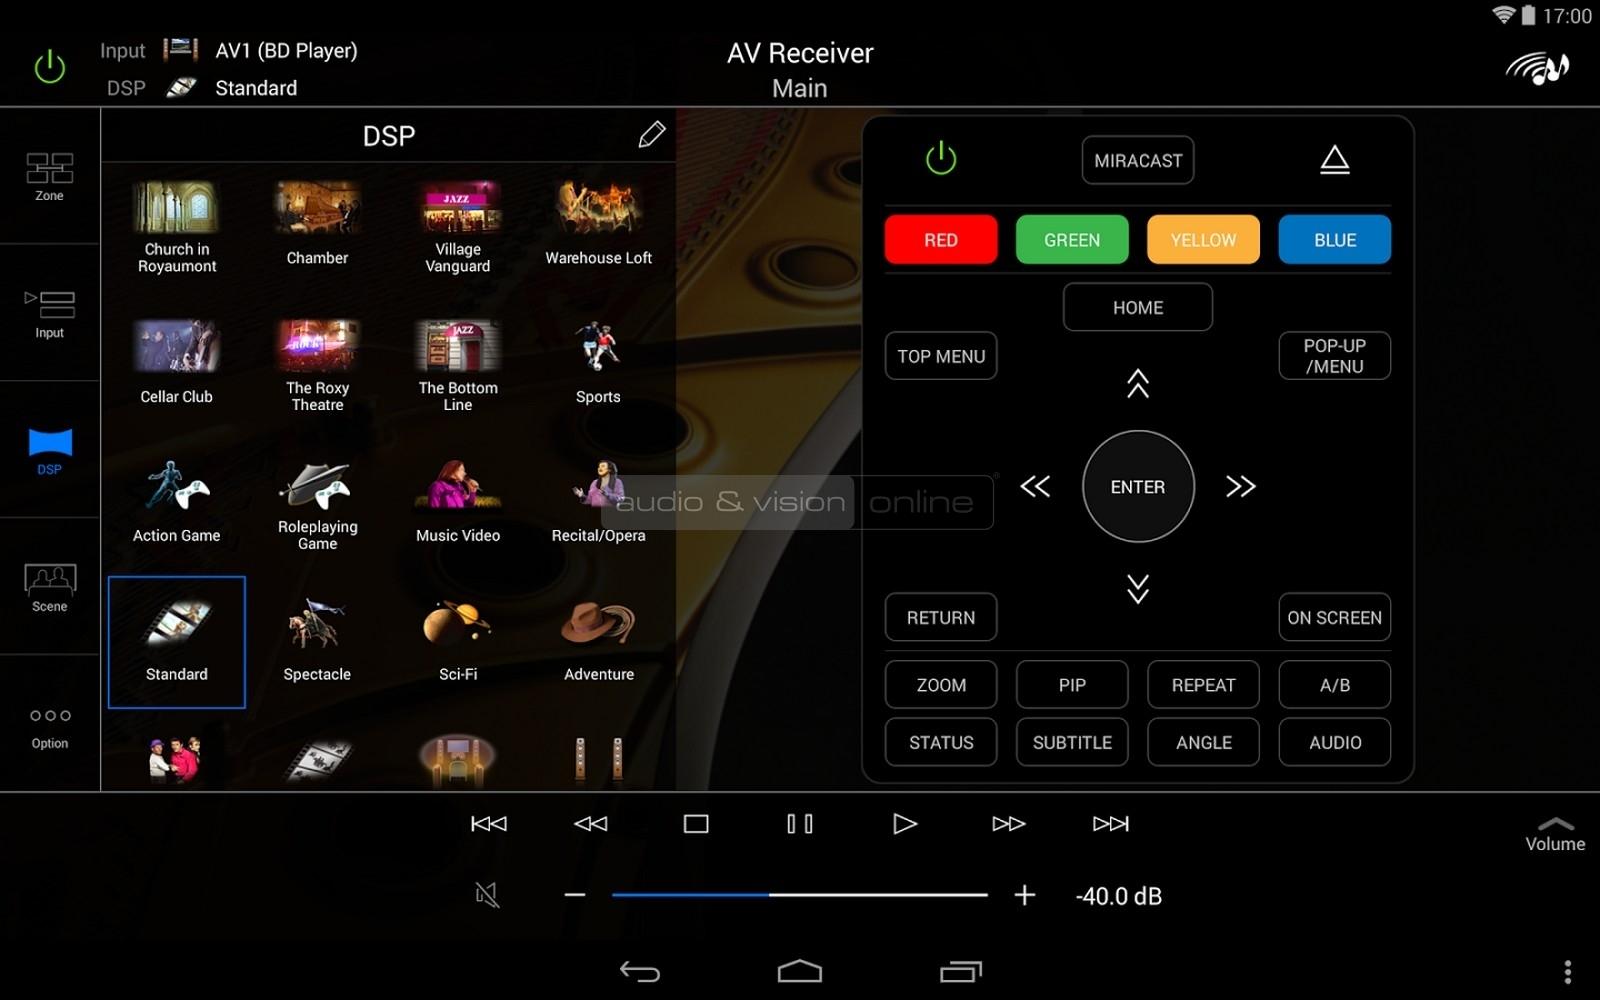 Yamaha Aventage Bd A1060 Blu Ray Lej 225 Tsz 243 Teszt Av Online Hu